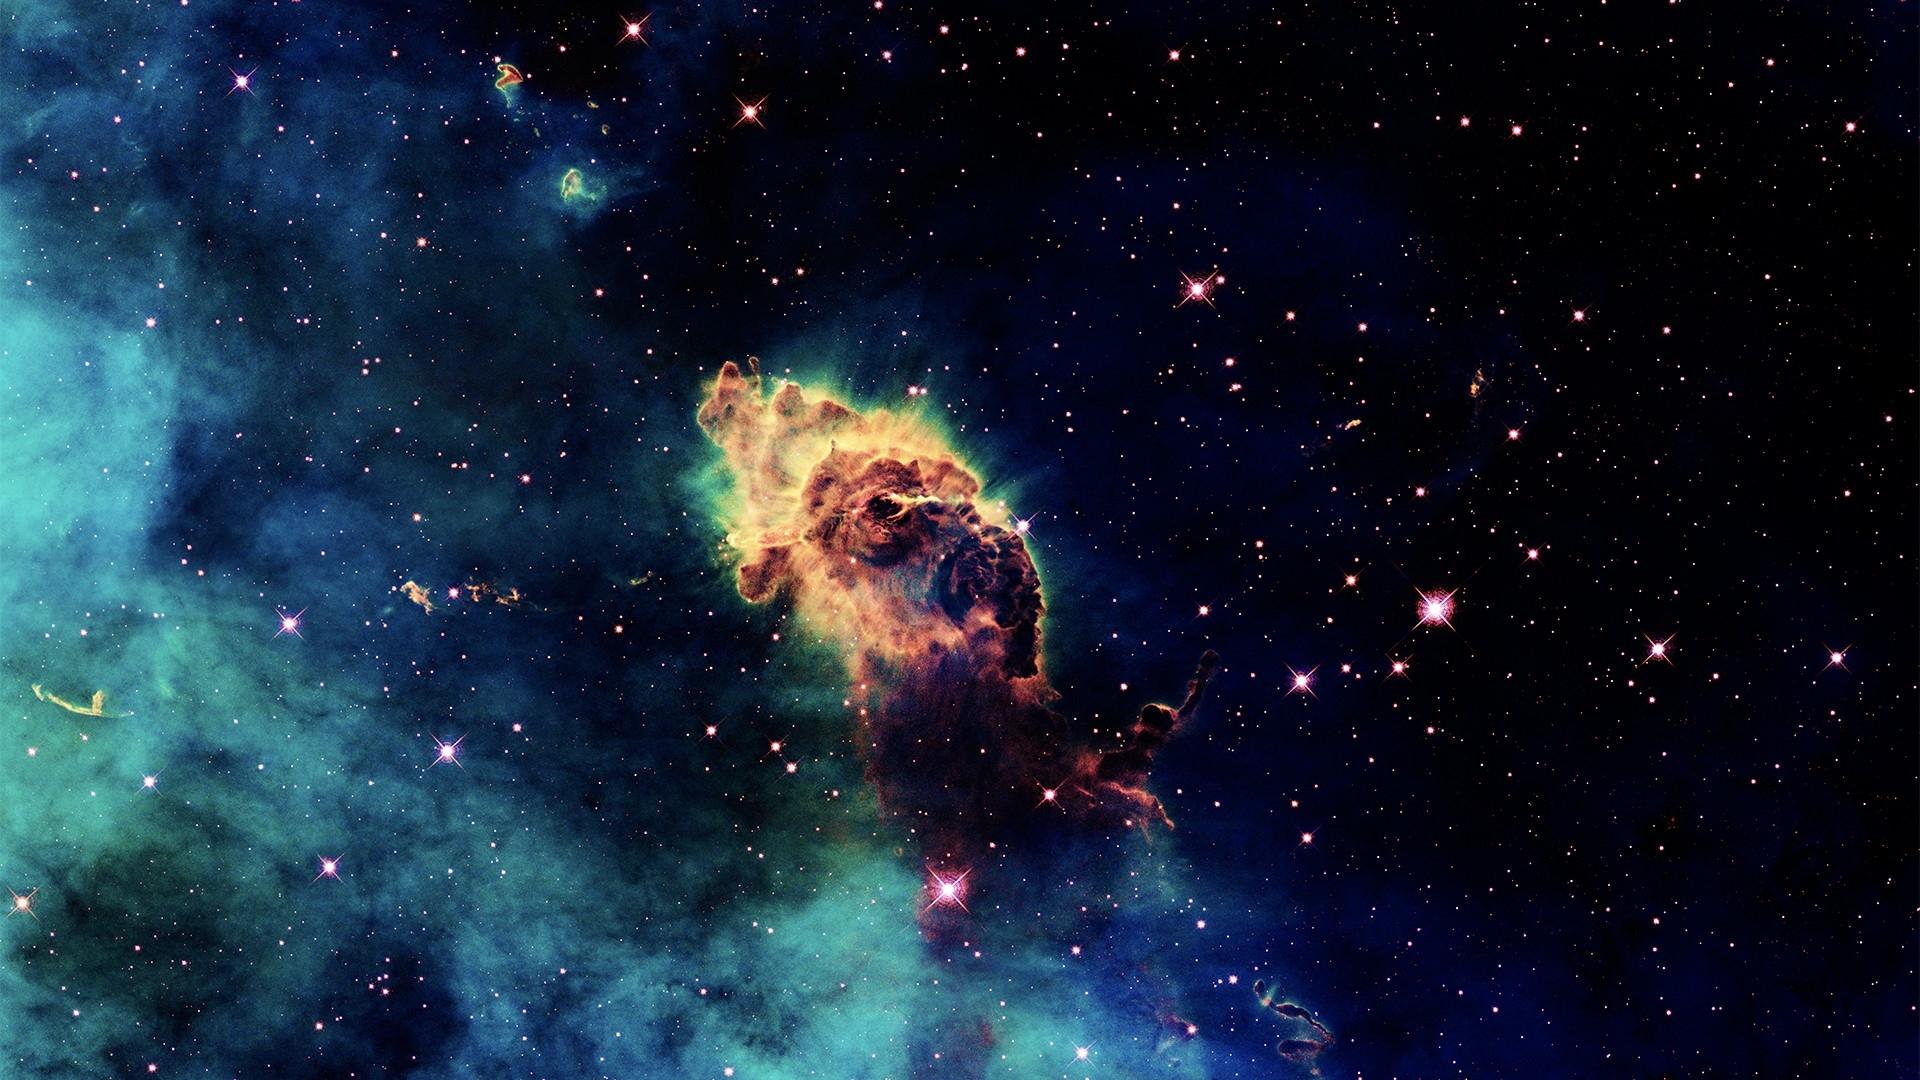 nebula desktop wallpapers 1920x1080 (67+ images)